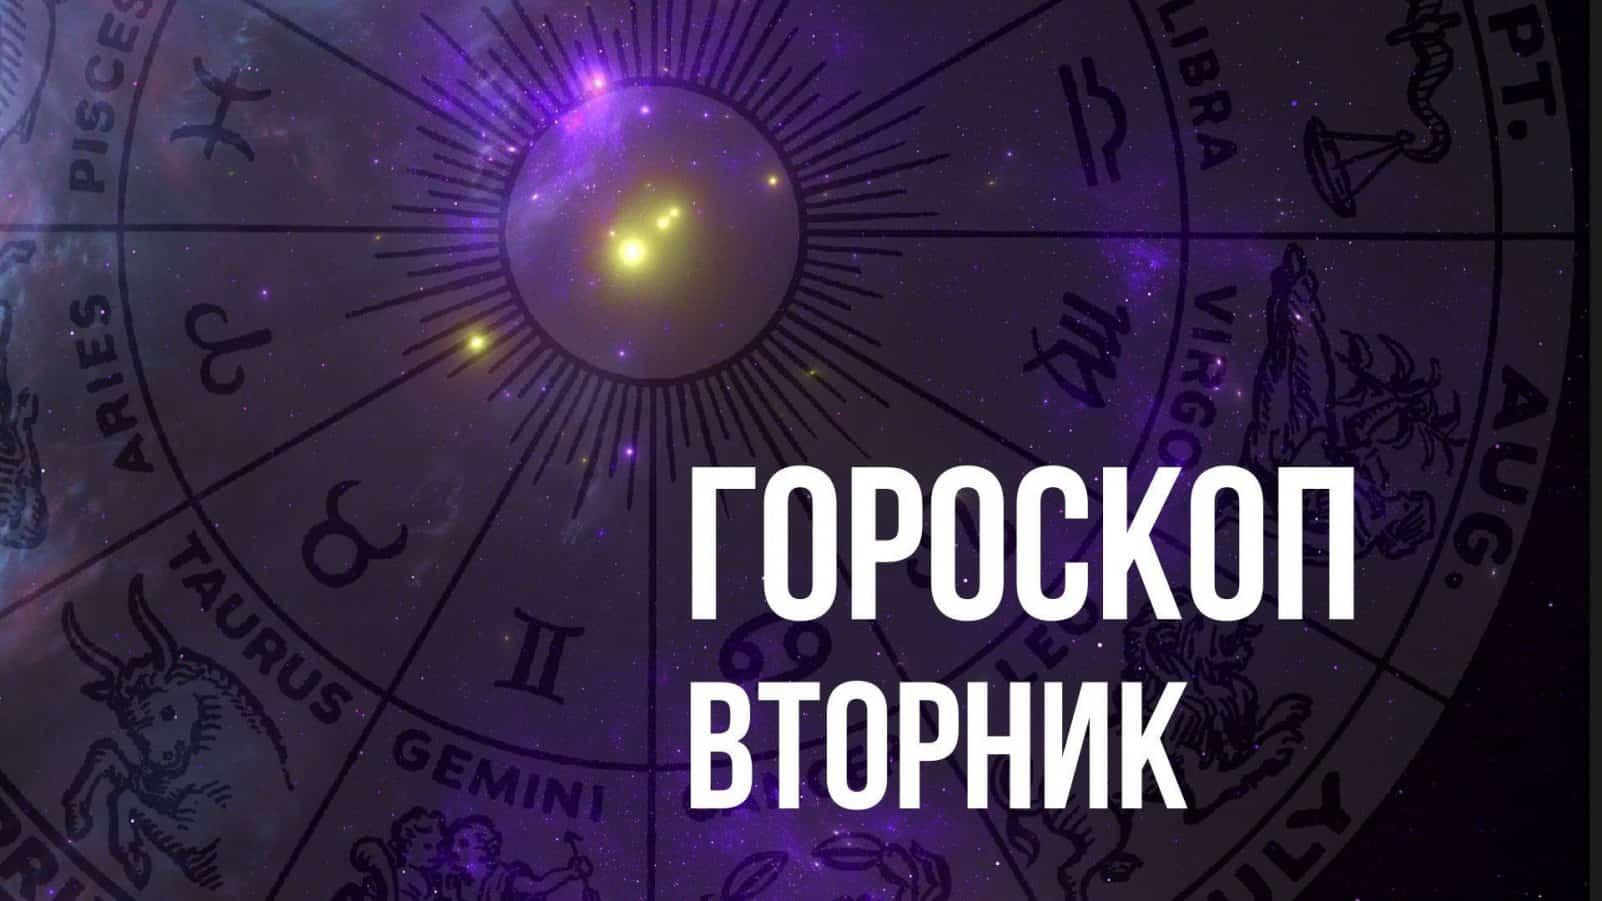 Гороскоп на вторник 27 апреля для каждого знака Зодиака